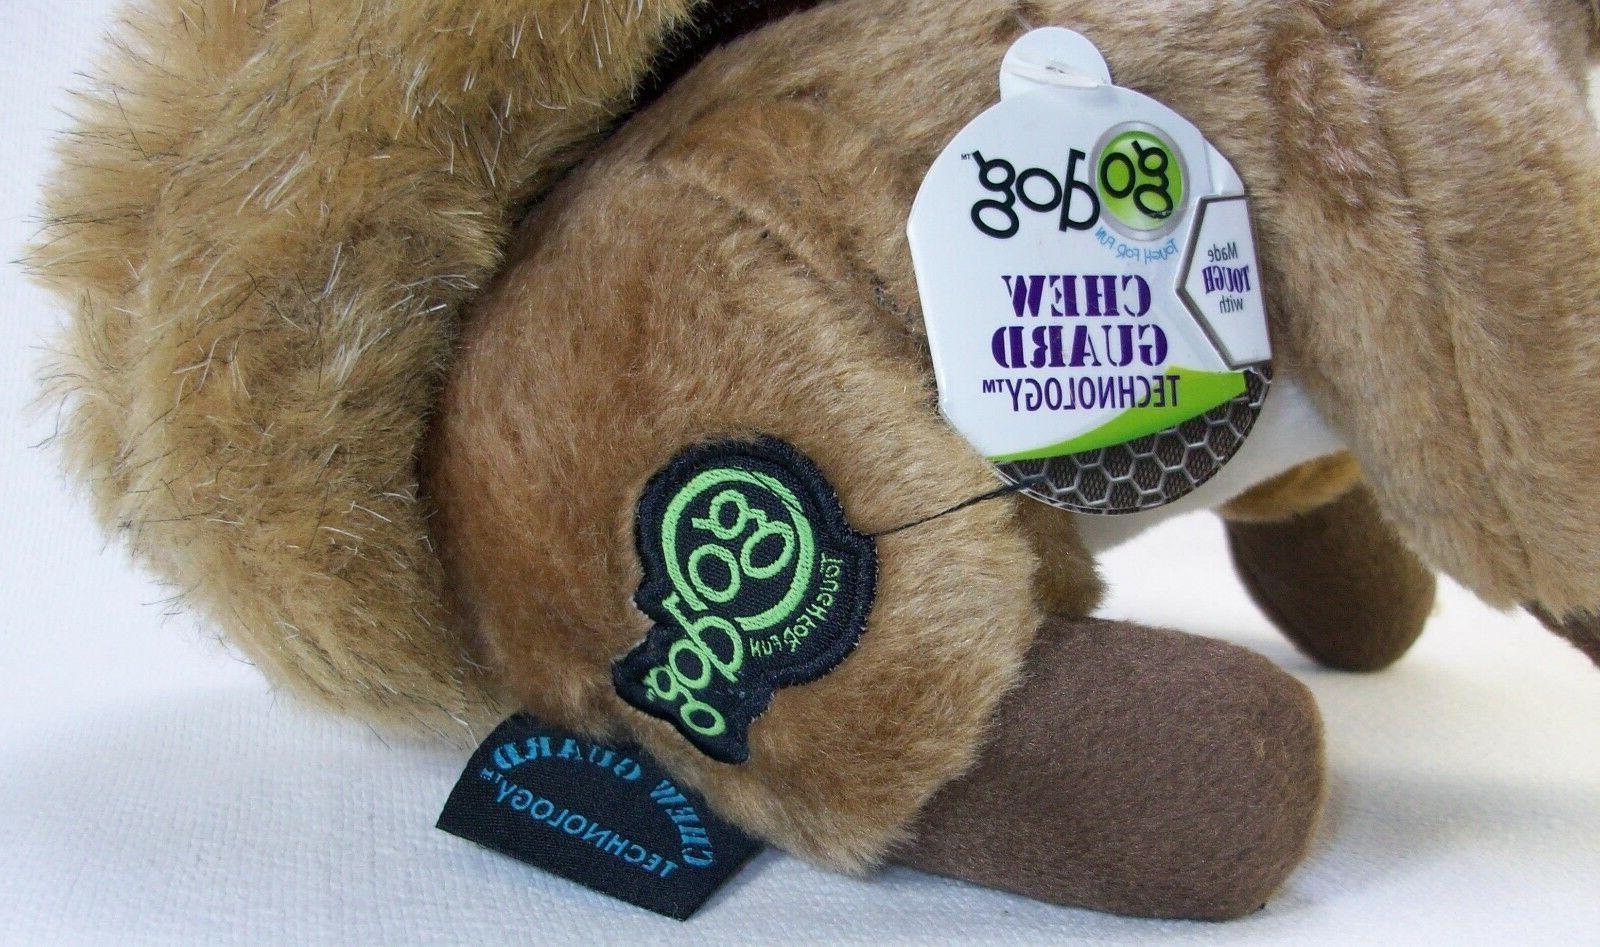 GoDog goDog Wildlife Dog Toy Squeaker Dog Toy with Guard Brand New